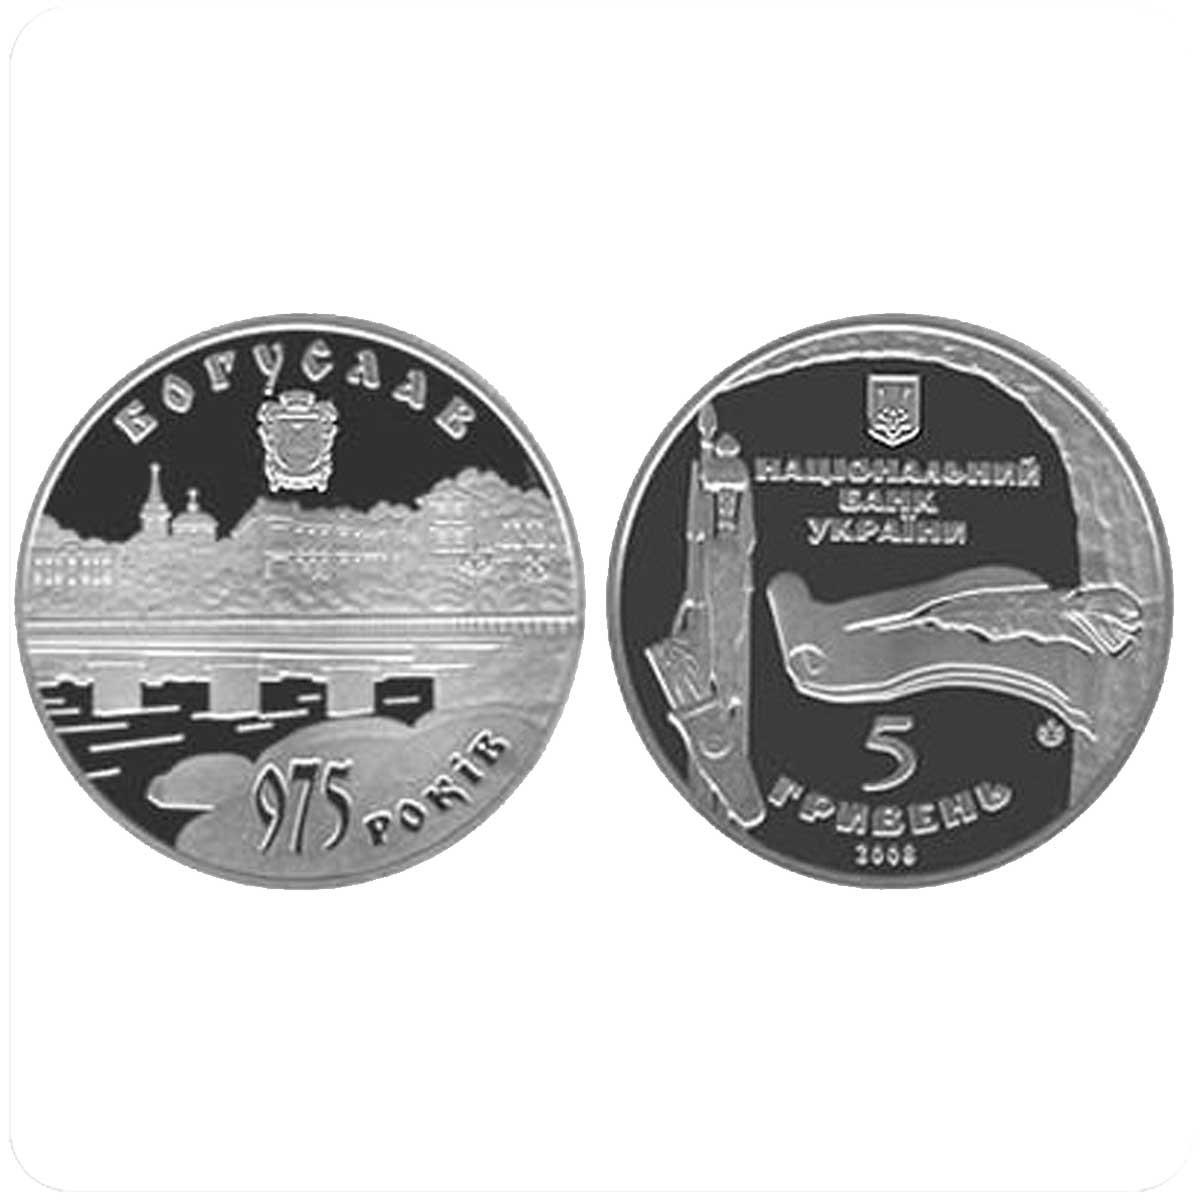 5 гривен 2008 — 975 лет городу Богуслав код 20947